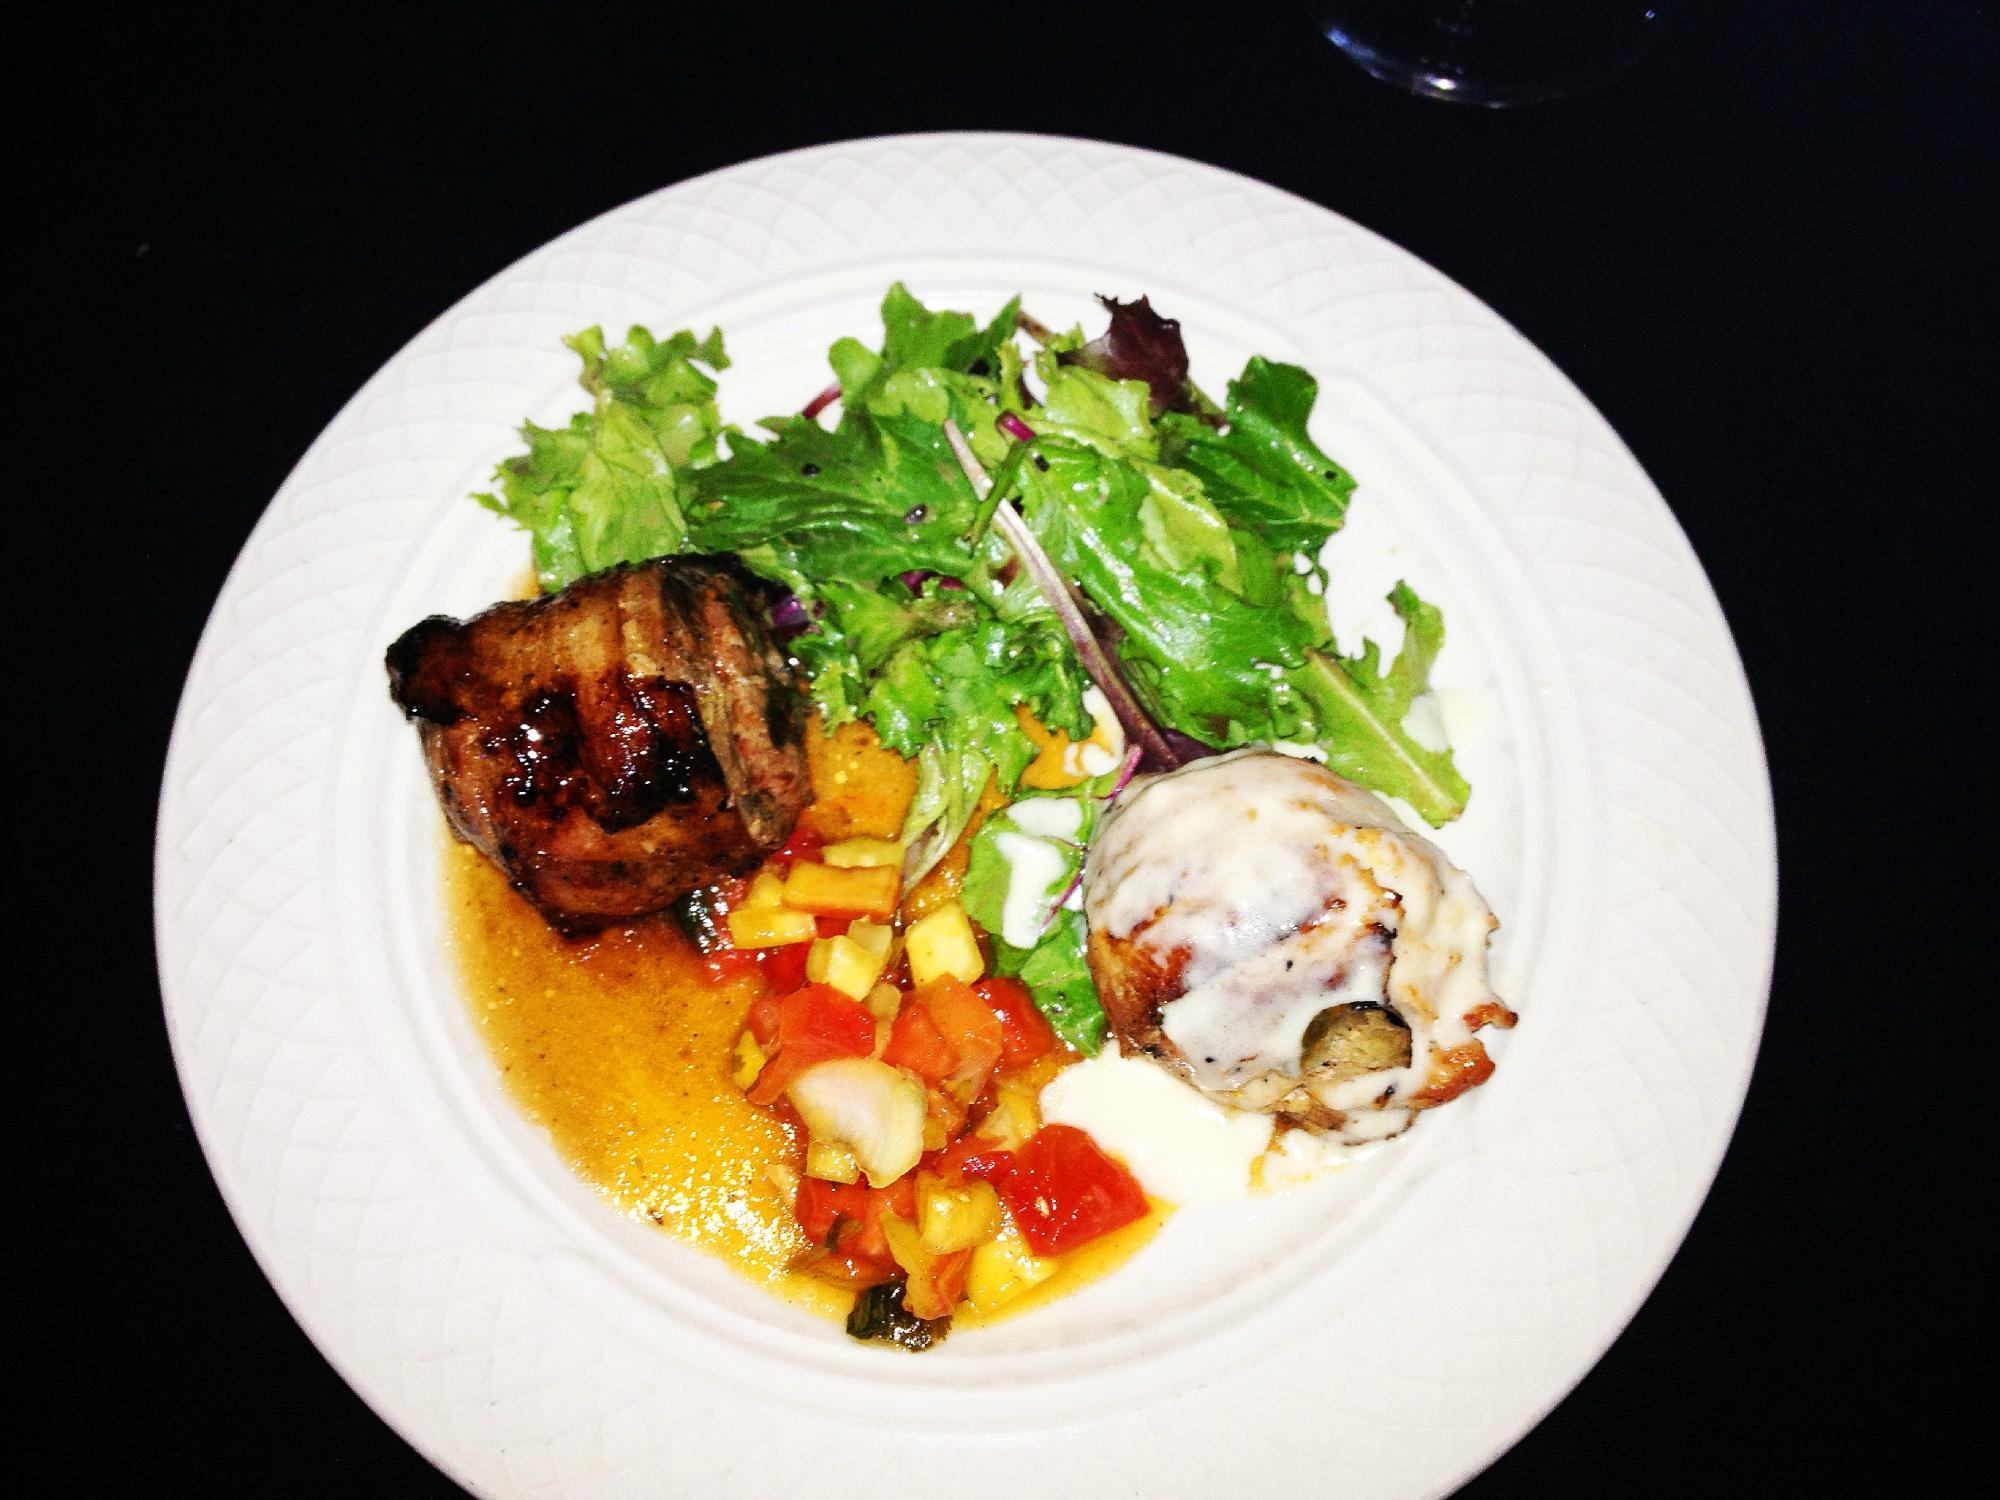 trios grill, cedar hill - menu, prices & restaurant reviews